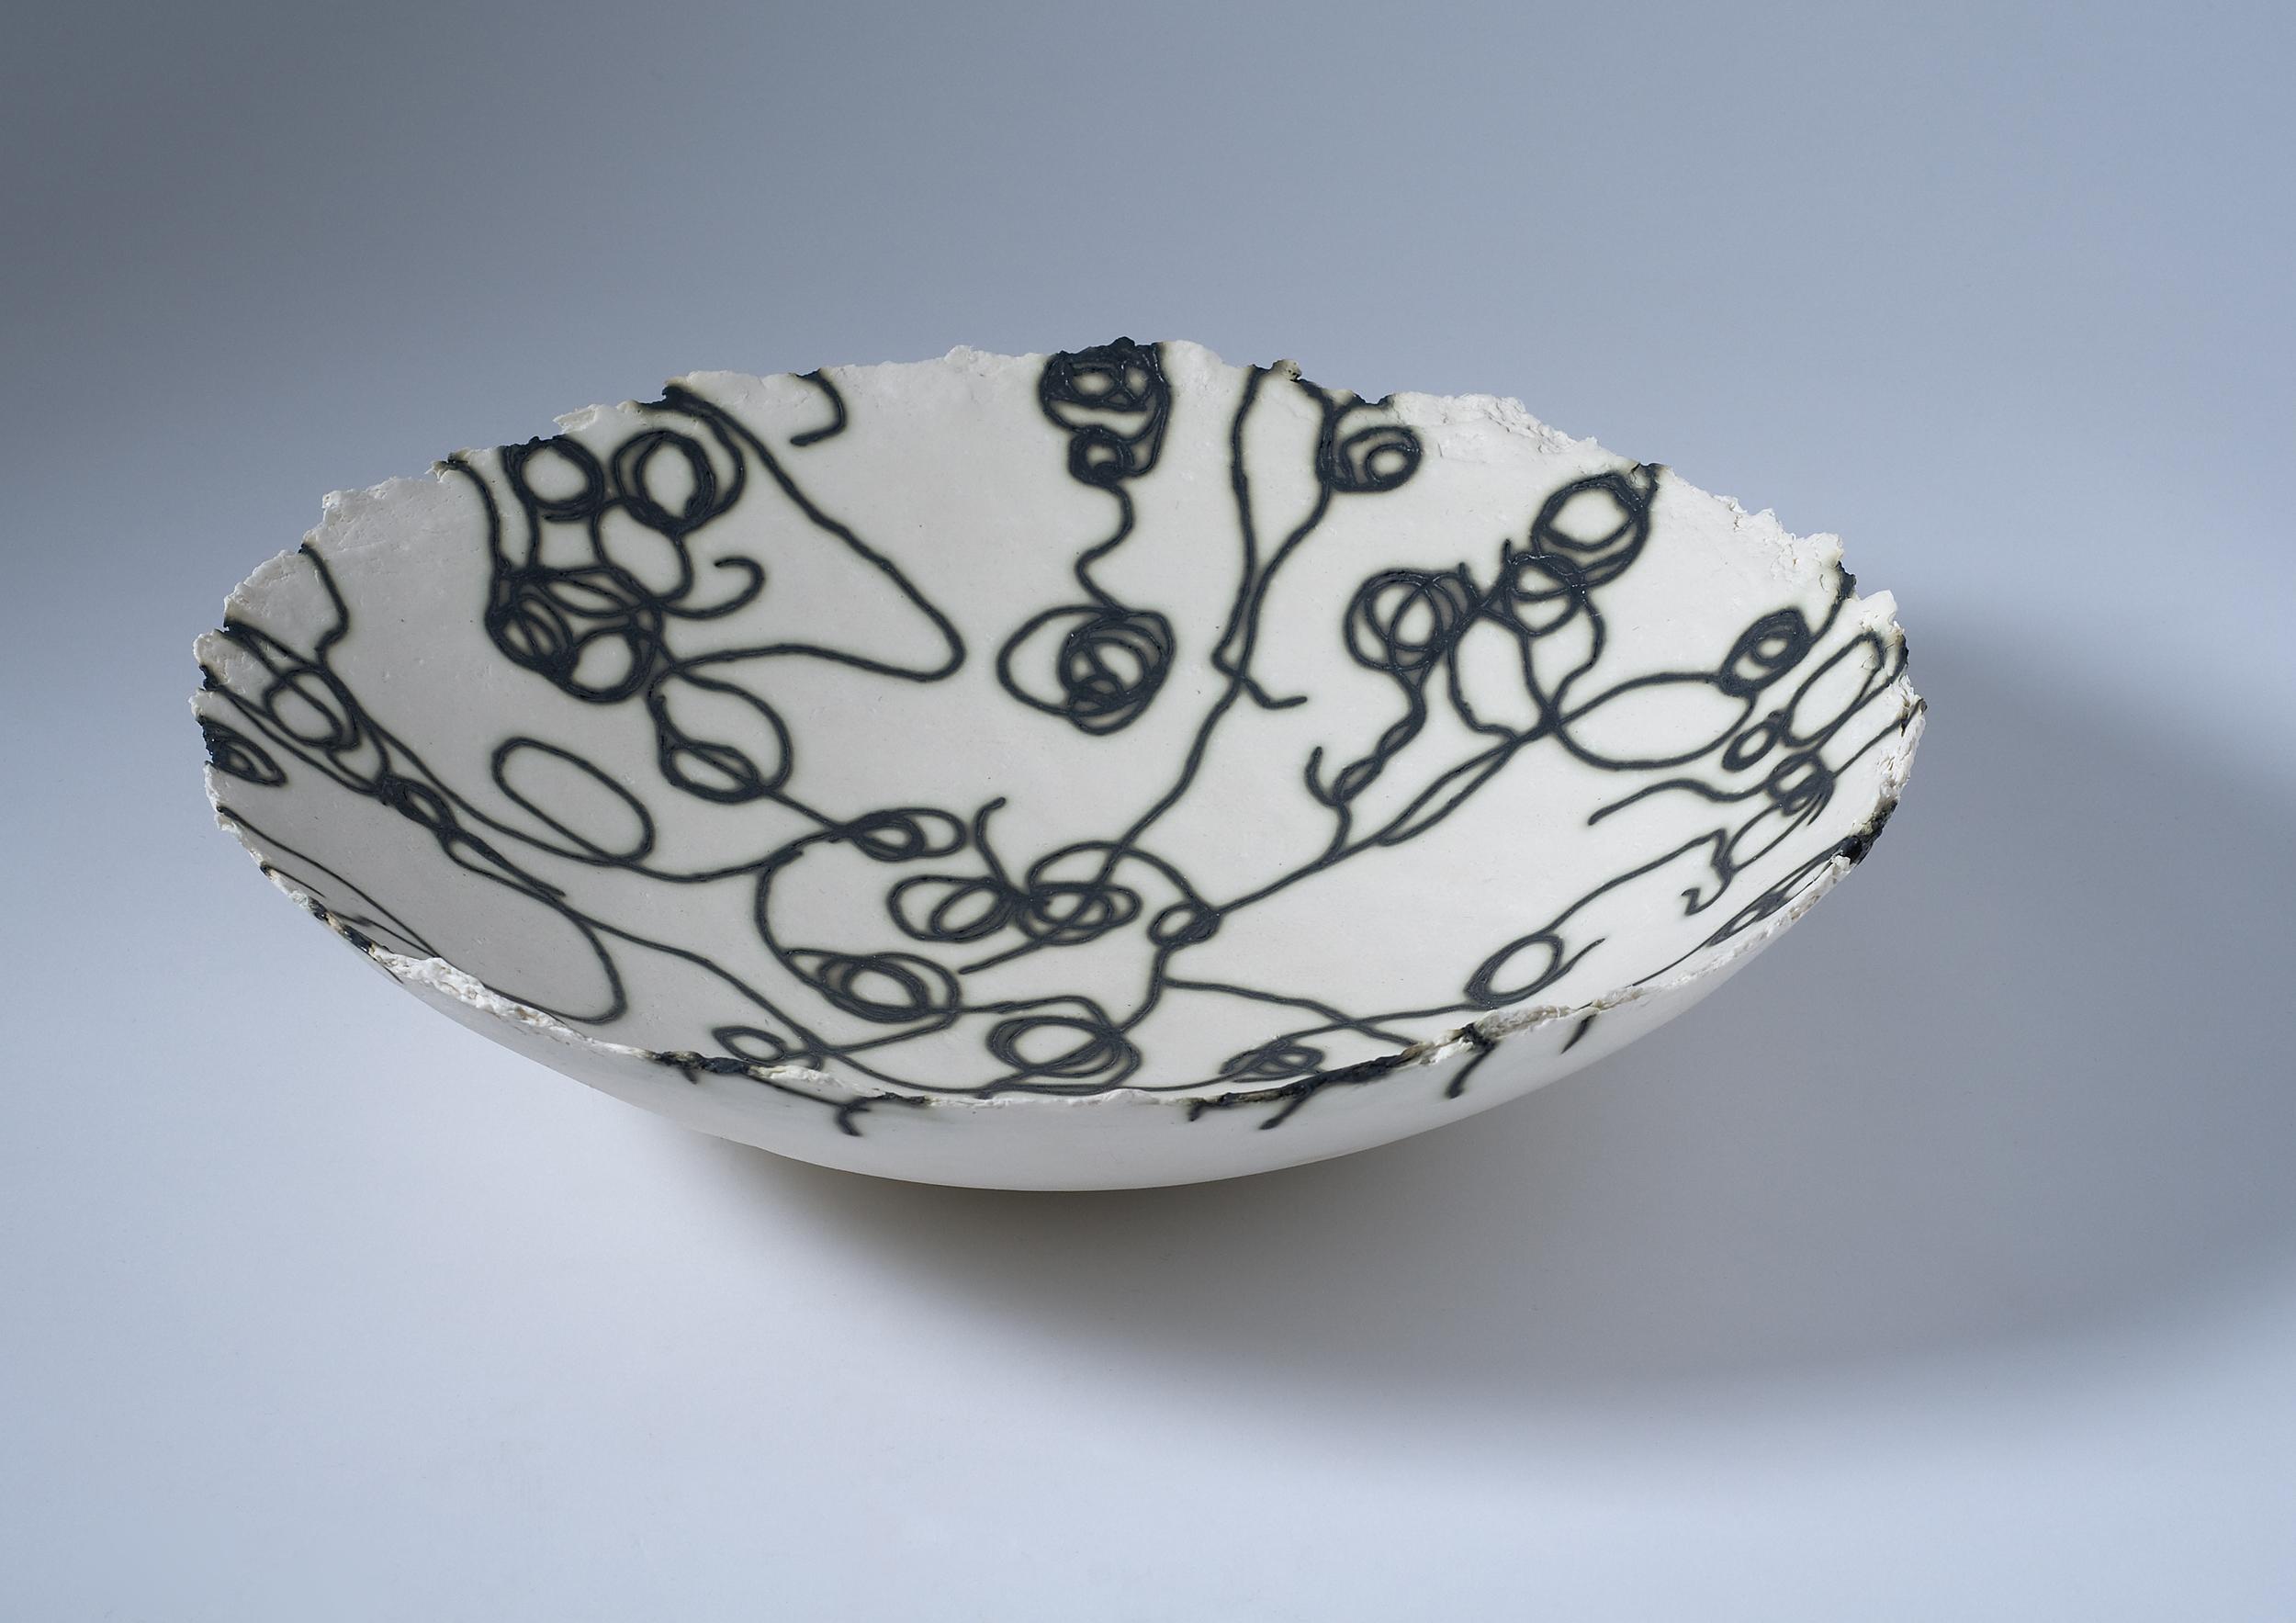 Squiggly porcelain bowl 20in diam £320.jpg